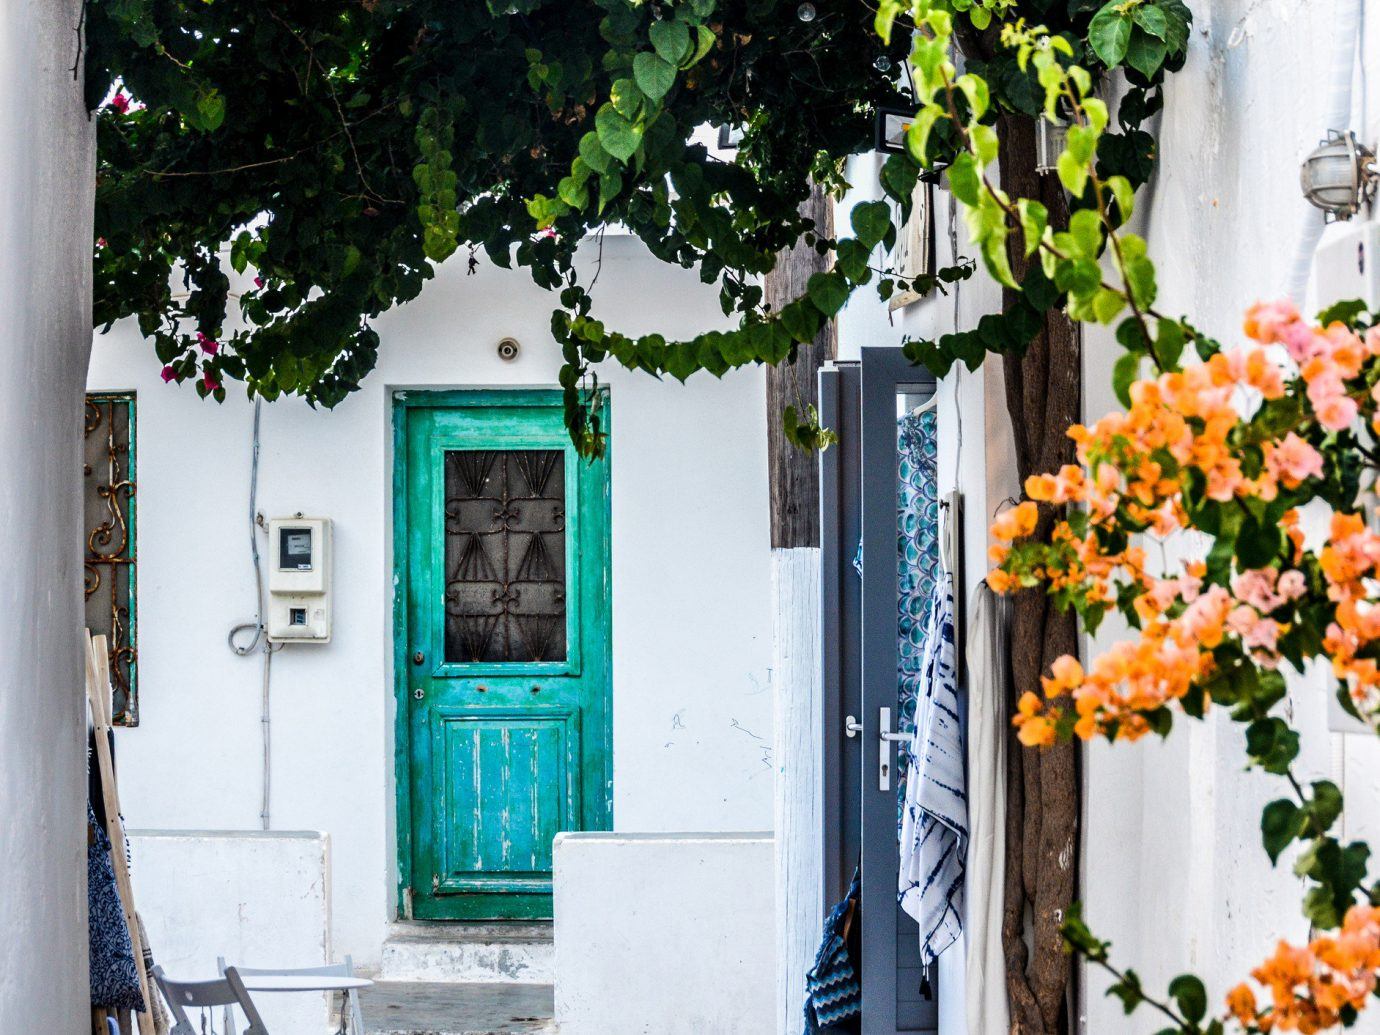 Offbeat color outdoor green house neighbourhood urban area street season flower home spring cottage window porch